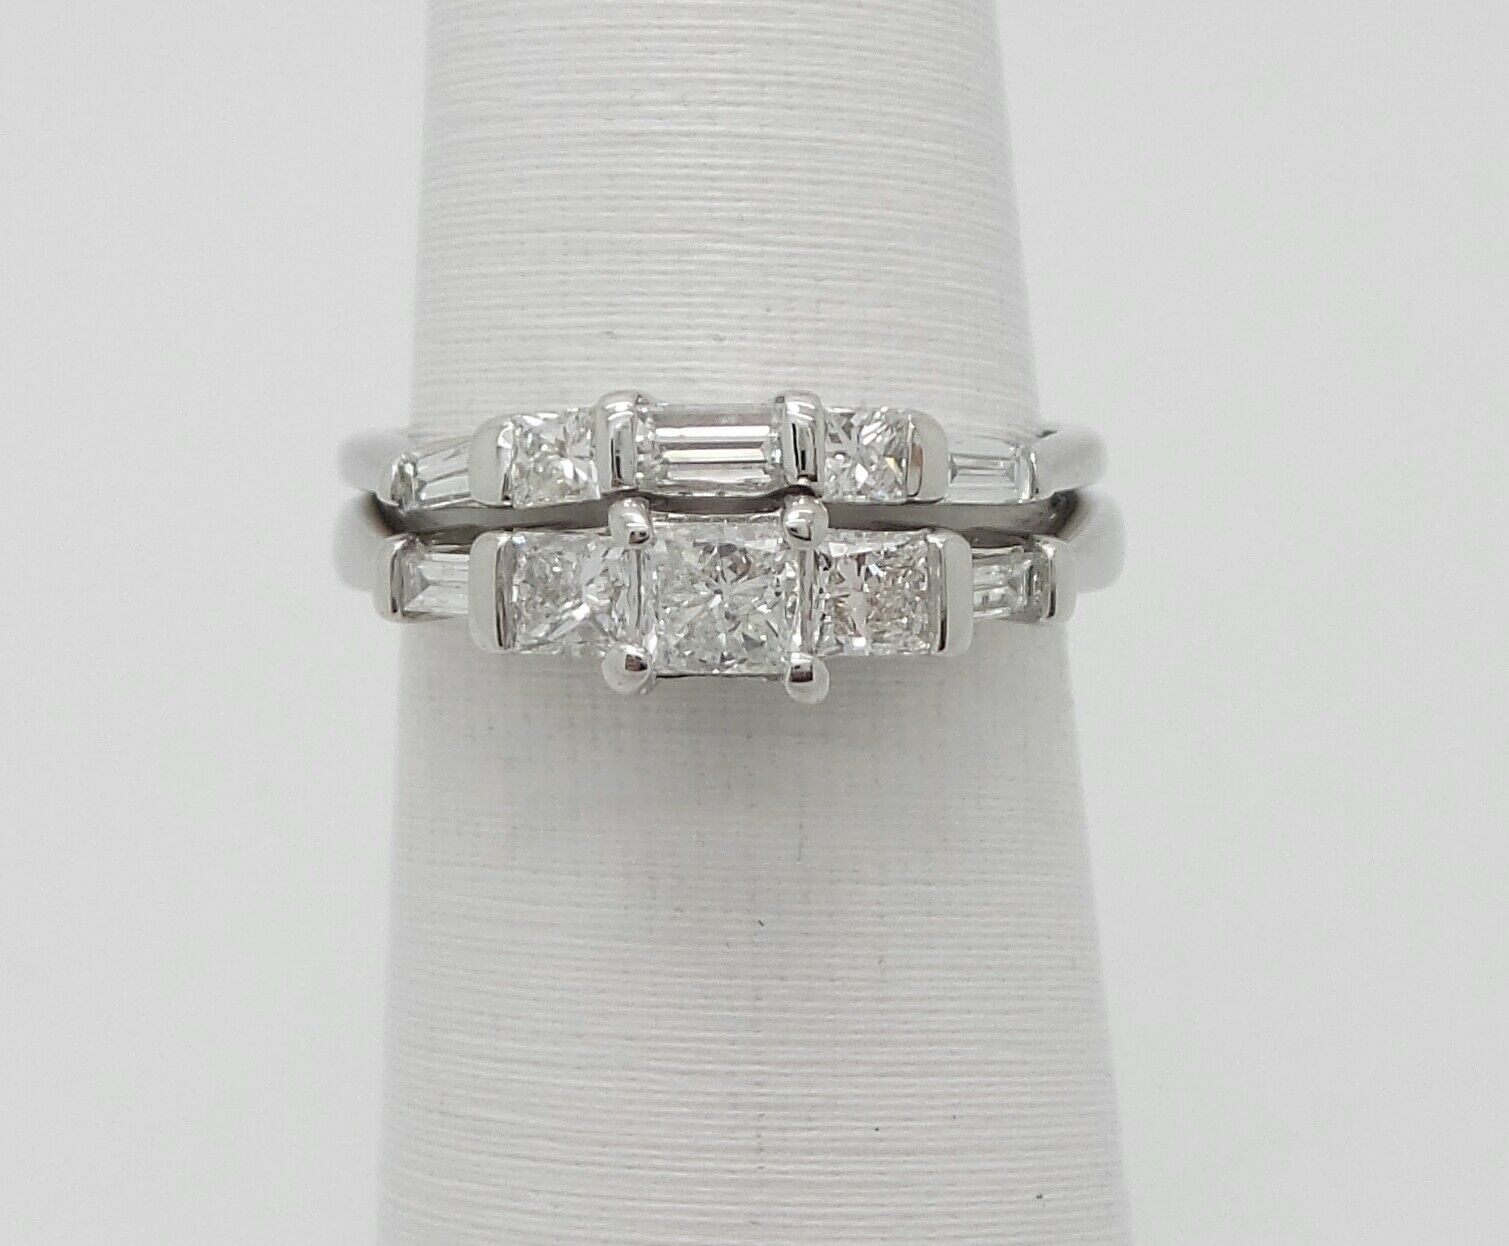 Zales 1CT Diamond Solitaire Engagement Wedding Bridal Set Ring 14K White gold